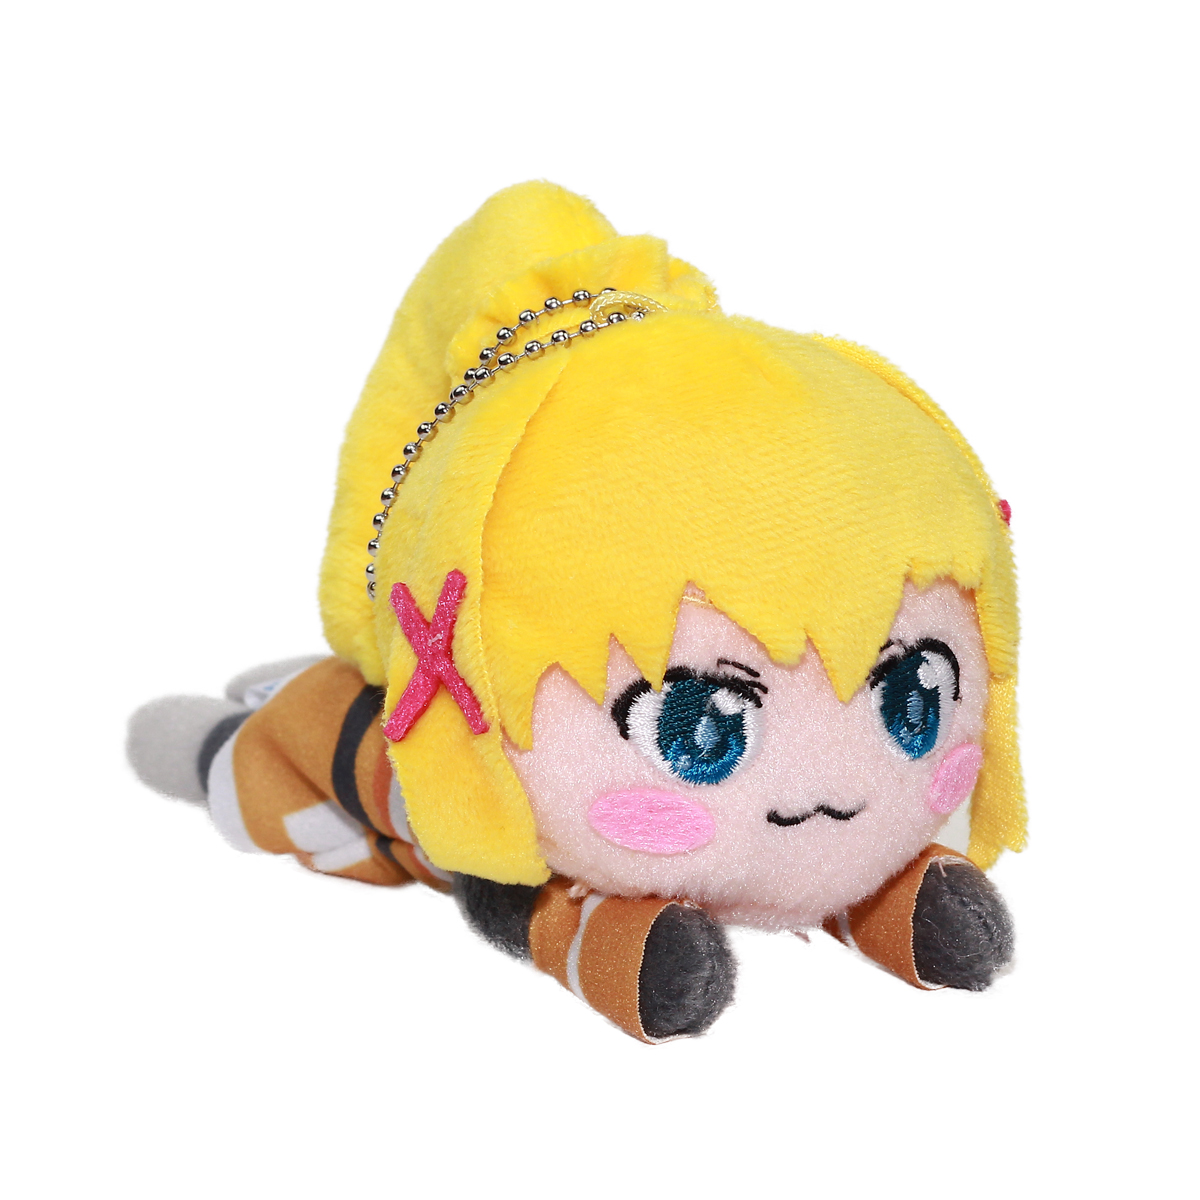 Konosuba Darkness Plush Doll Gods Blessing on This Wonderful World!, Sega, Keychain Size 5 Inches